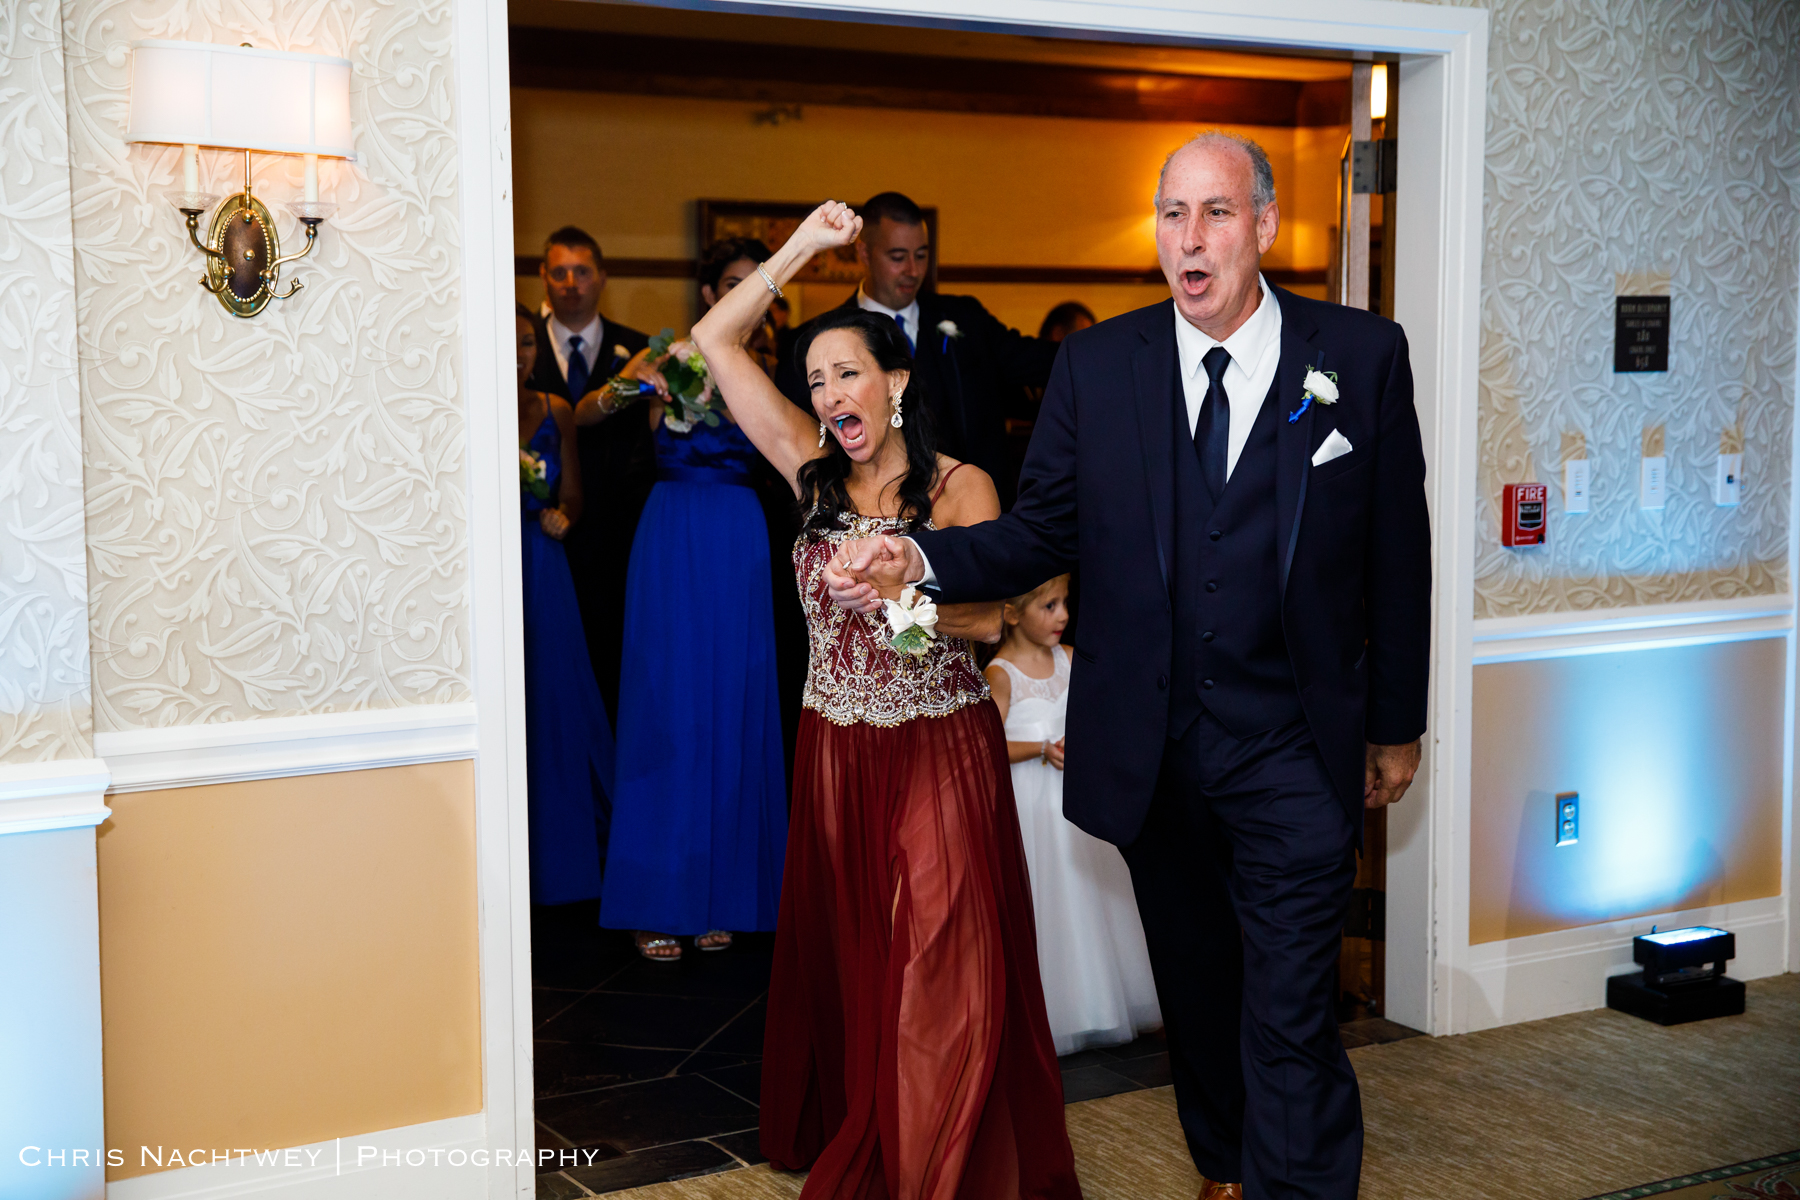 wedding-lake-of-isles-photos-chris-nachtwey-photography-2019-49.jpg